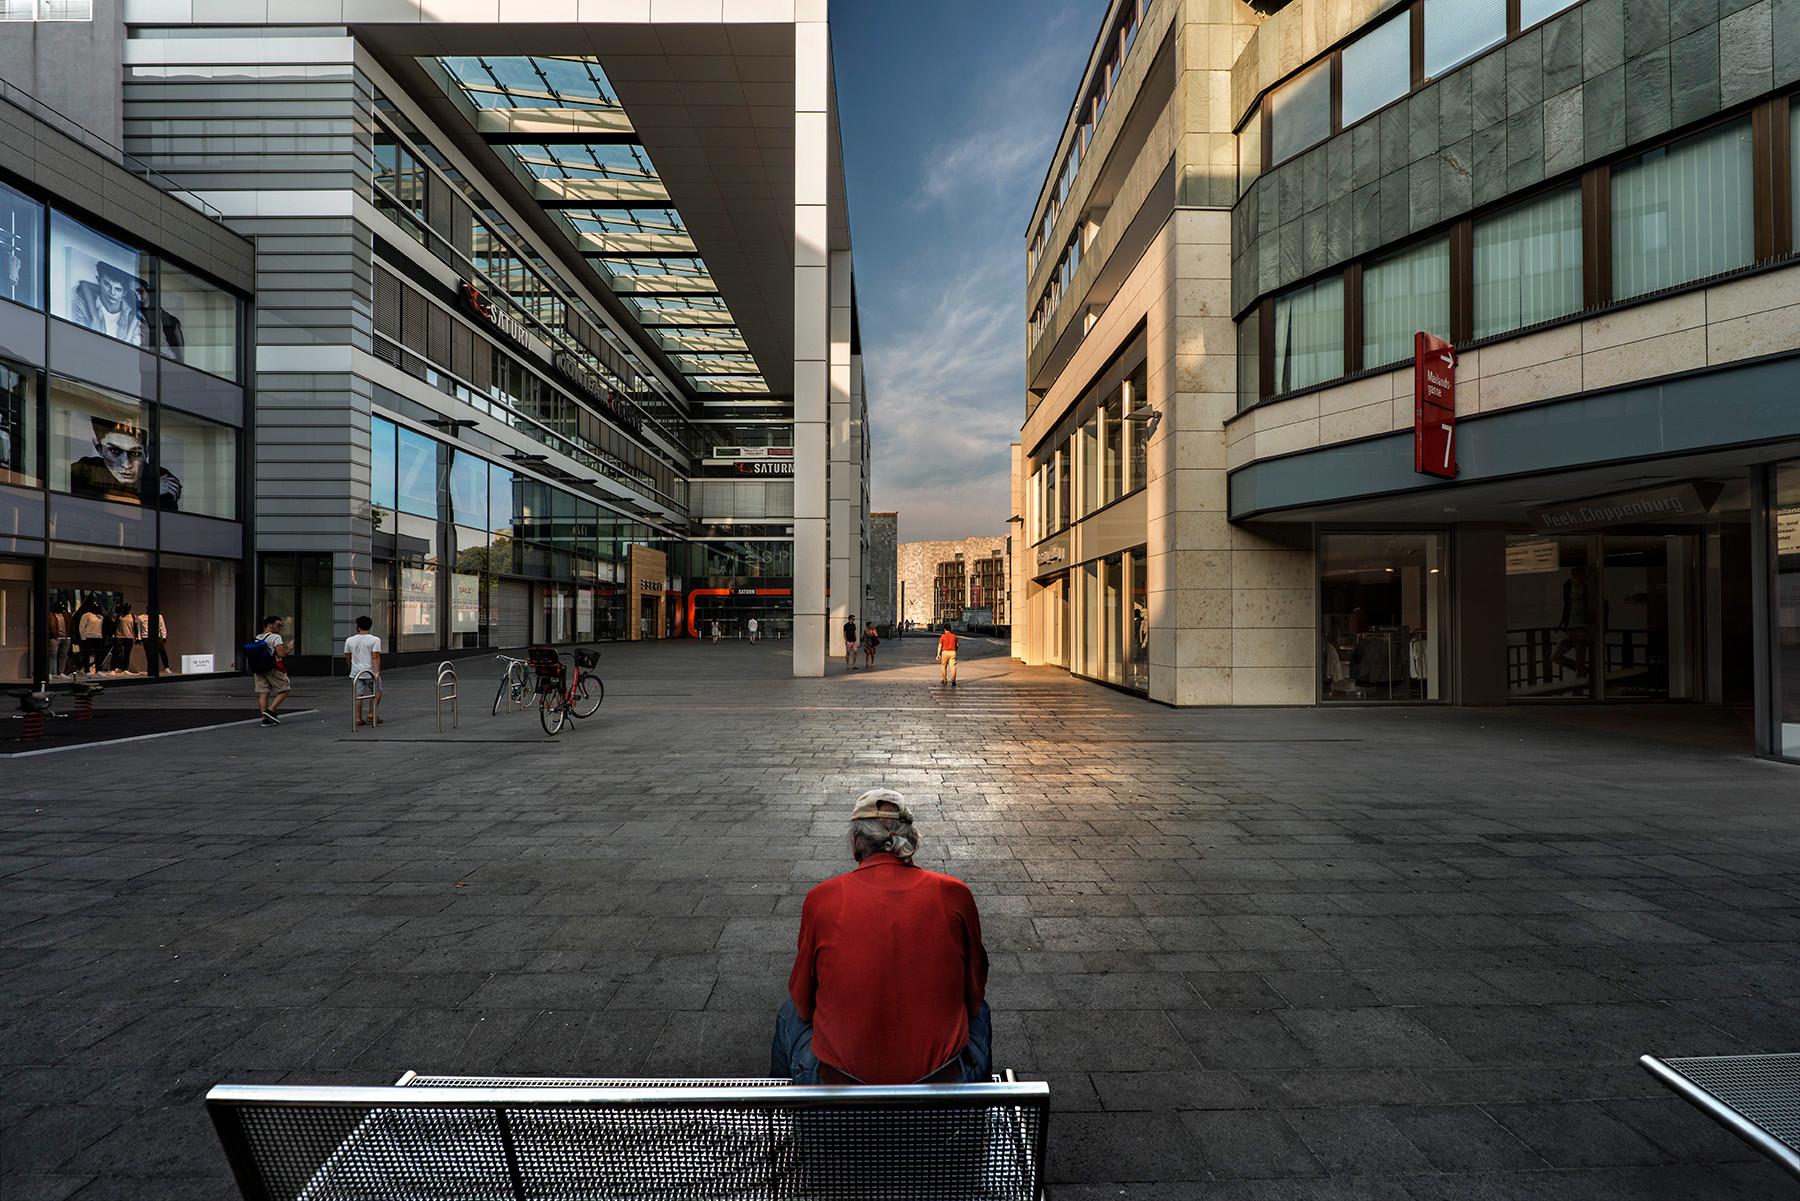 Solitary man (Mainz, Germany)